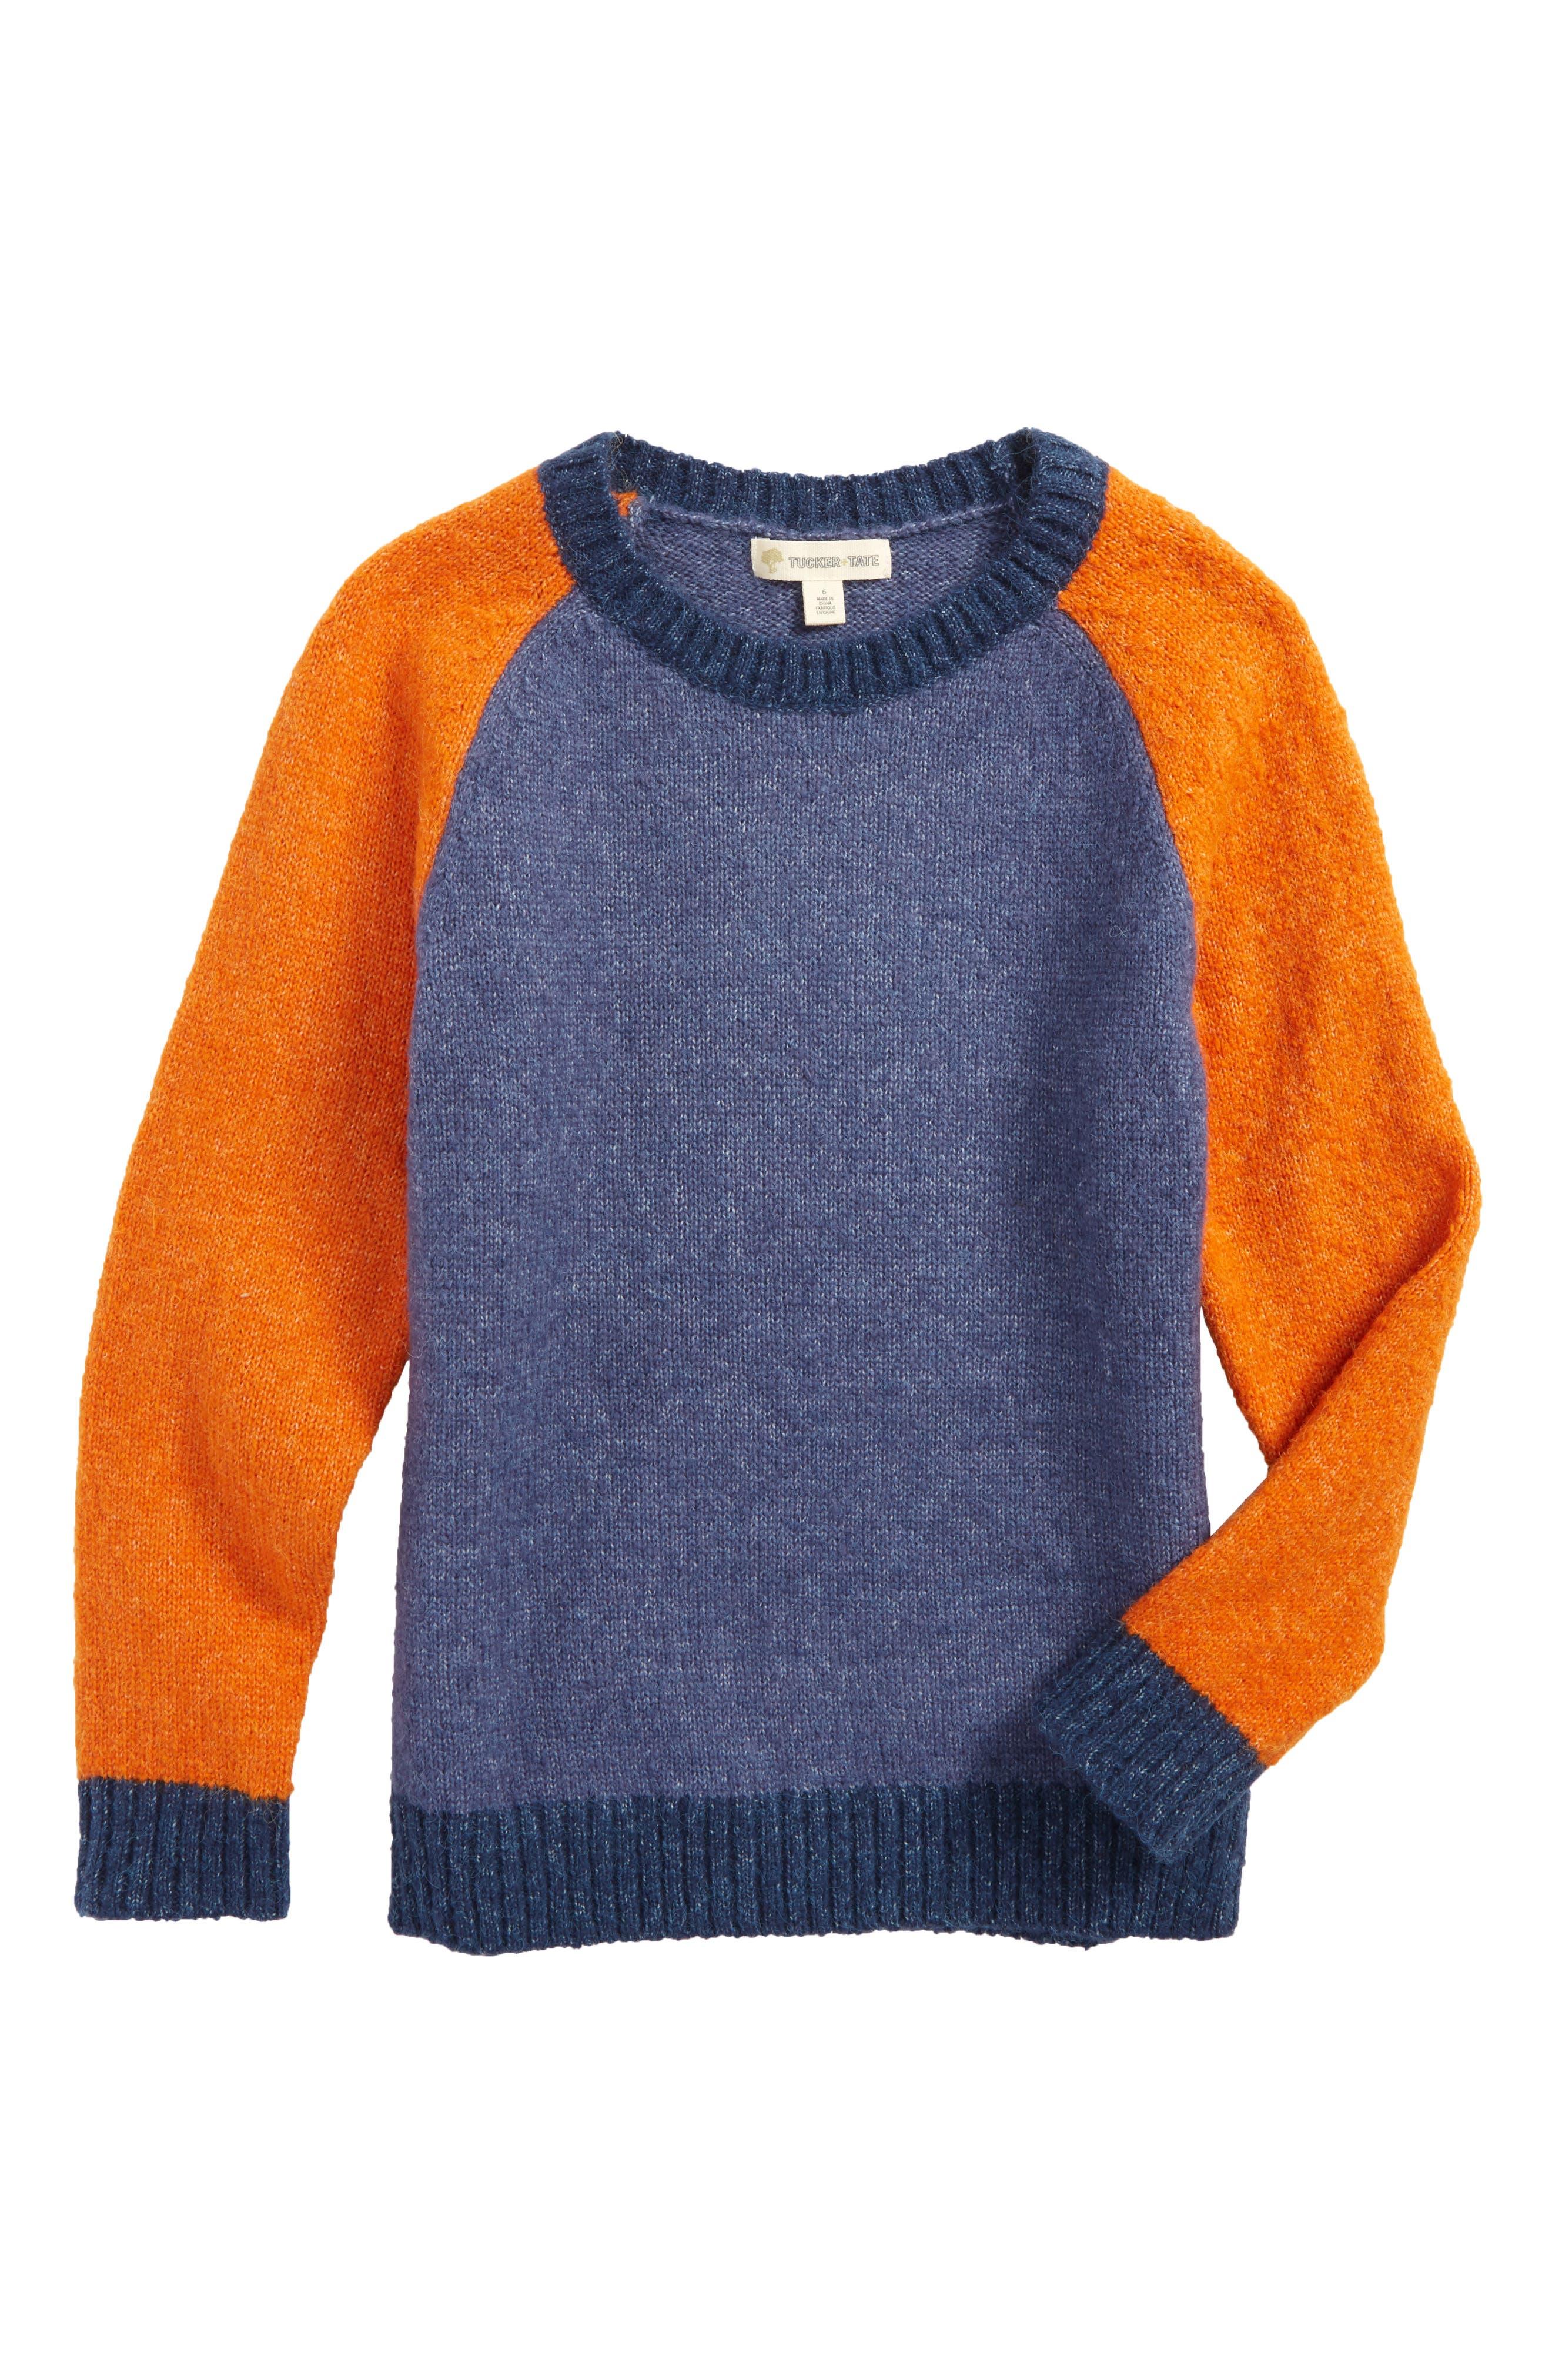 Colorblock Sweater,                             Main thumbnail 1, color,                             420